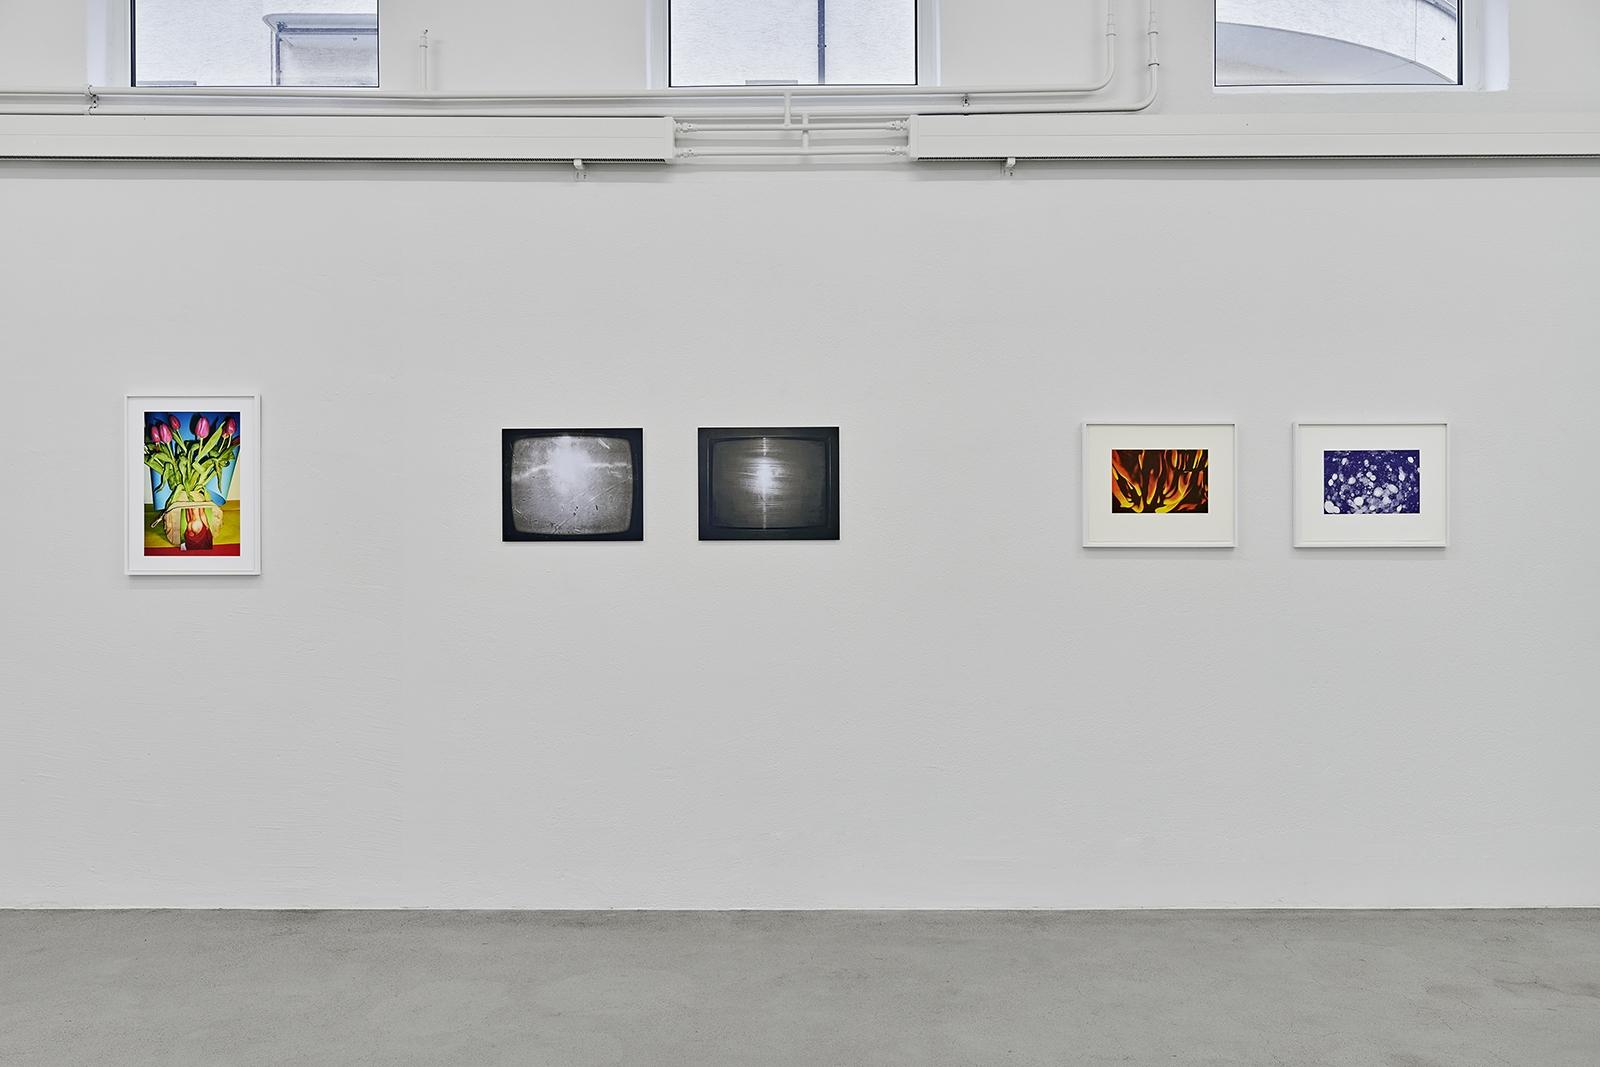 Ausstellungsansicht Walter Pfeiffer, Daniela Comani, Andreas Züst